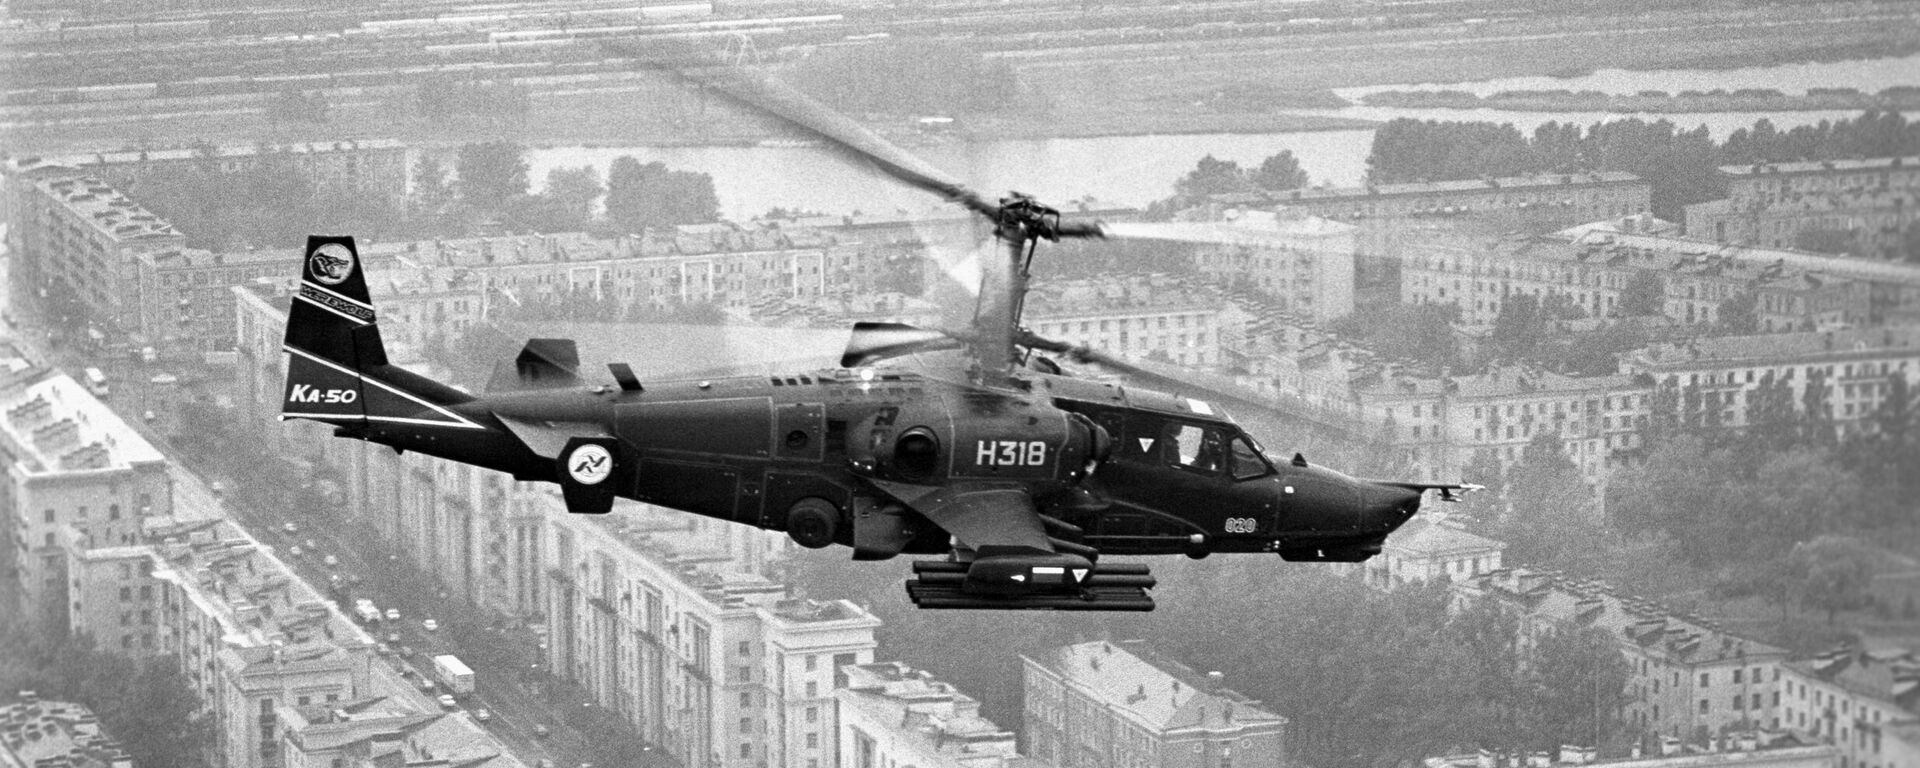 Helicóptero de ataque Ka-50 Tiburón Negro - Sputnik Mundo, 1920, 17.02.2021